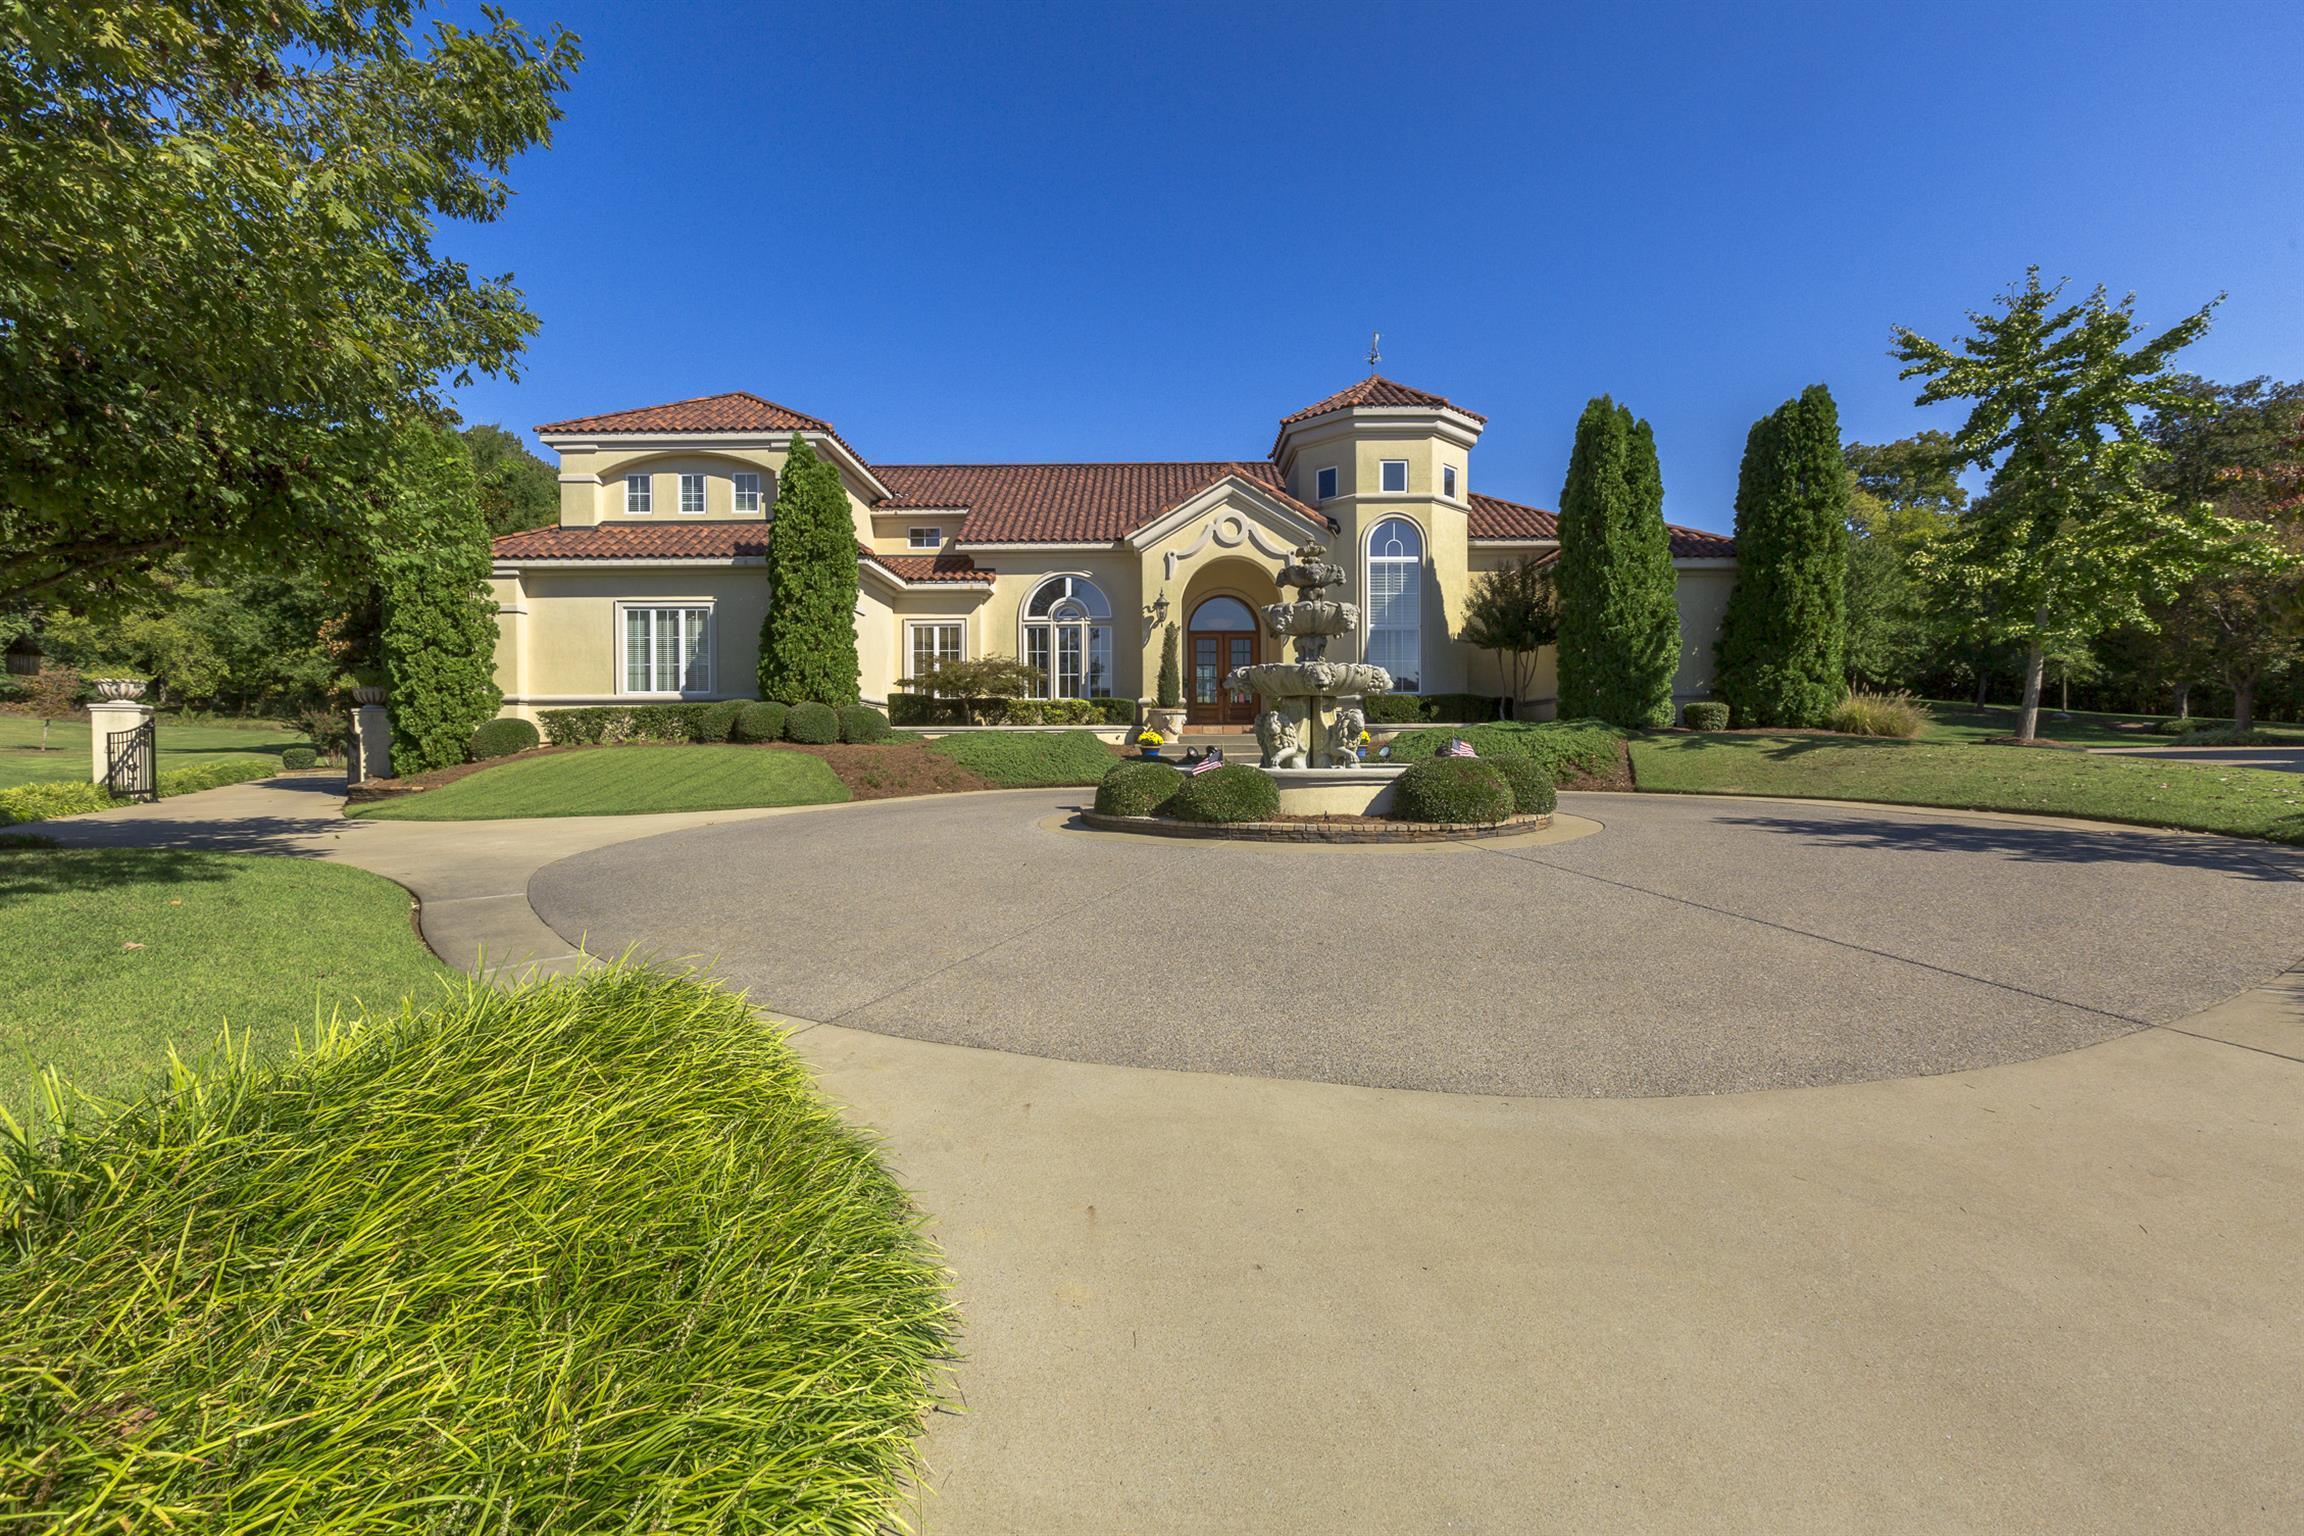 519 Glenway Cv, Lebanon, TN 37087 - Lebanon, TN real estate listing